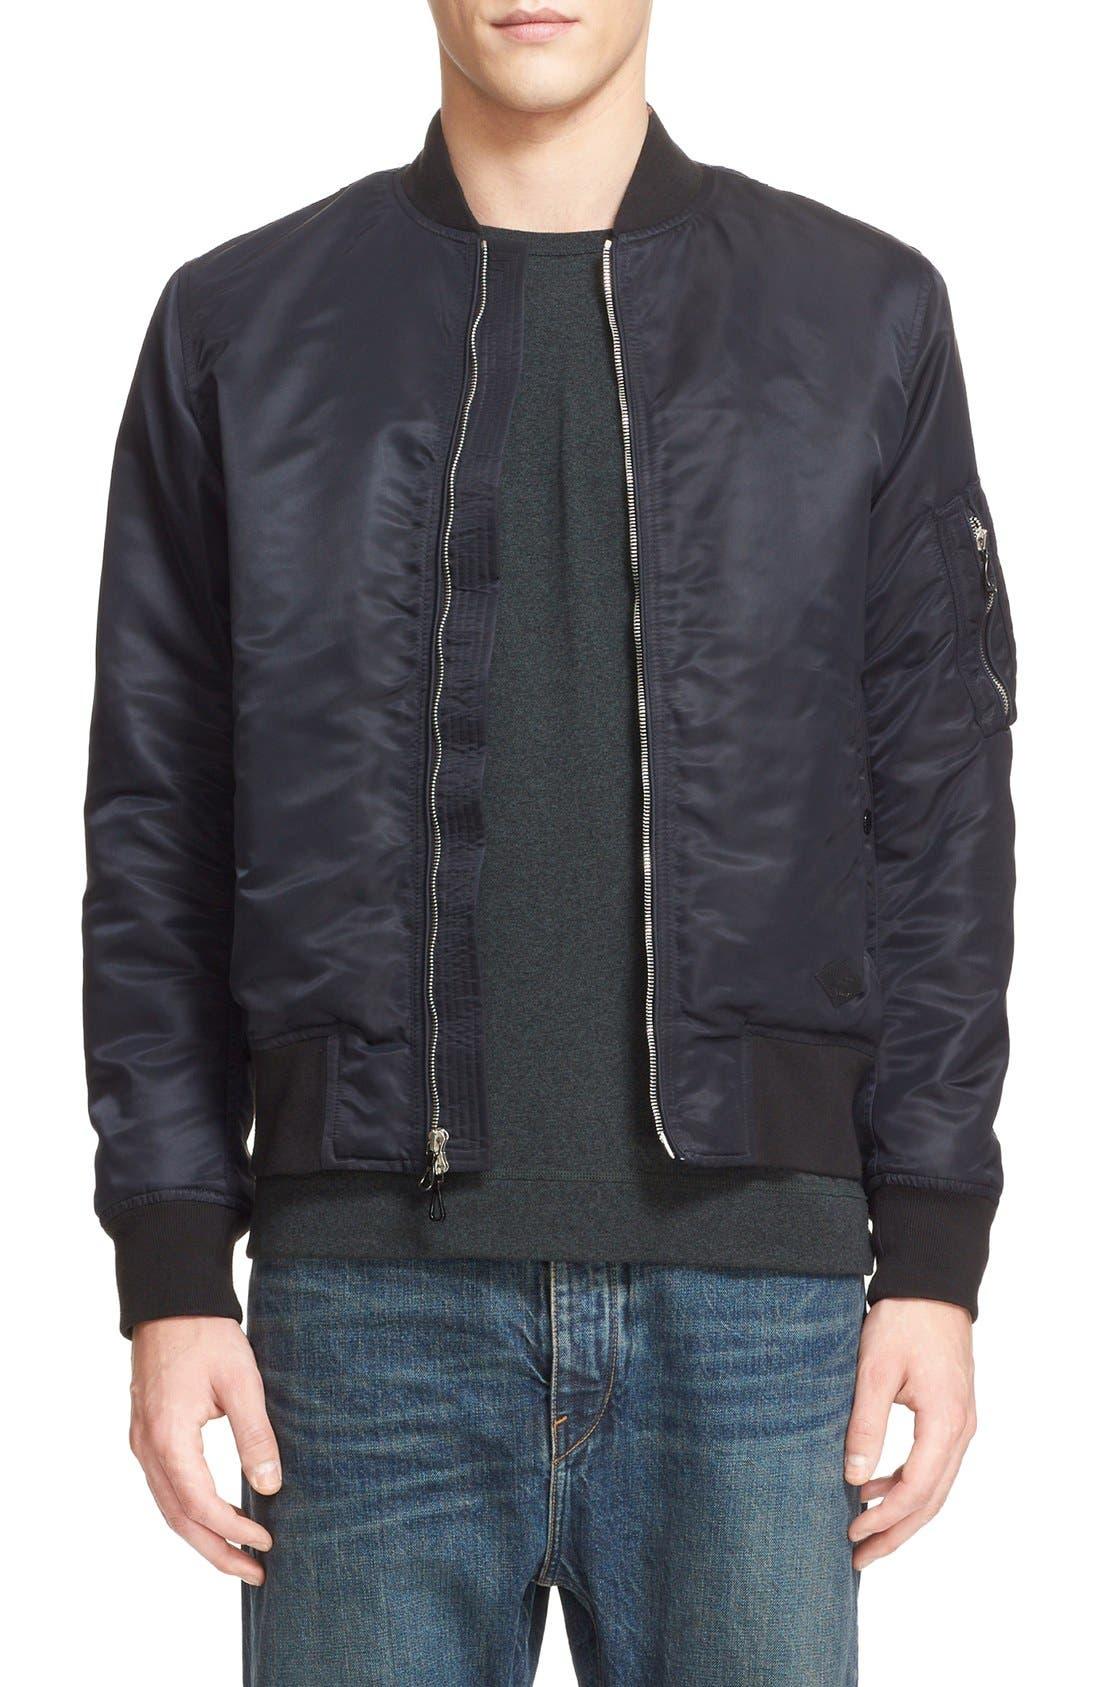 Manston Bomber Jacket,                         Main,                         color, 001